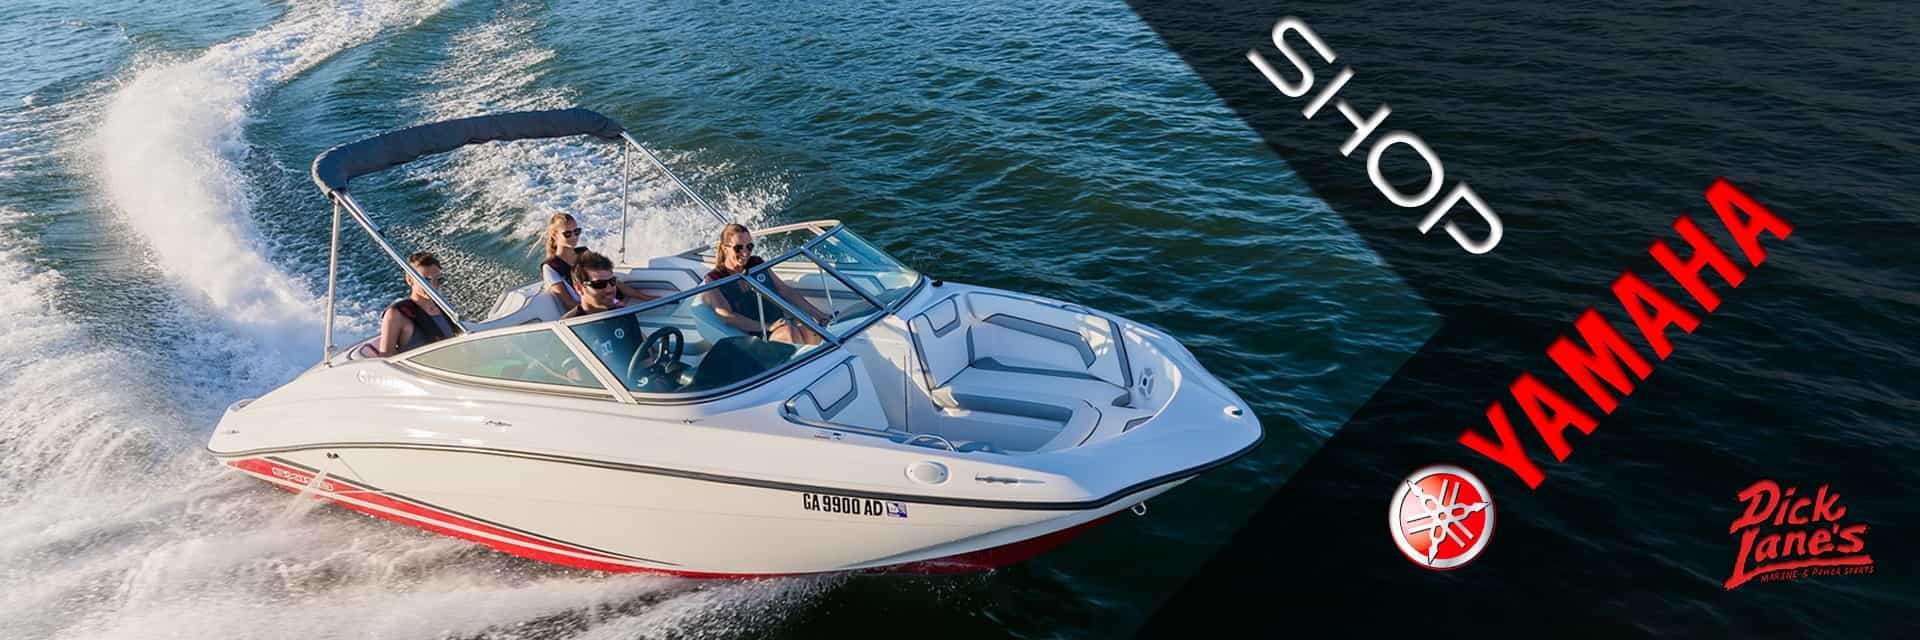 Marine & Powersports Vehicles for Sale | Sea-Doo, Yamaha